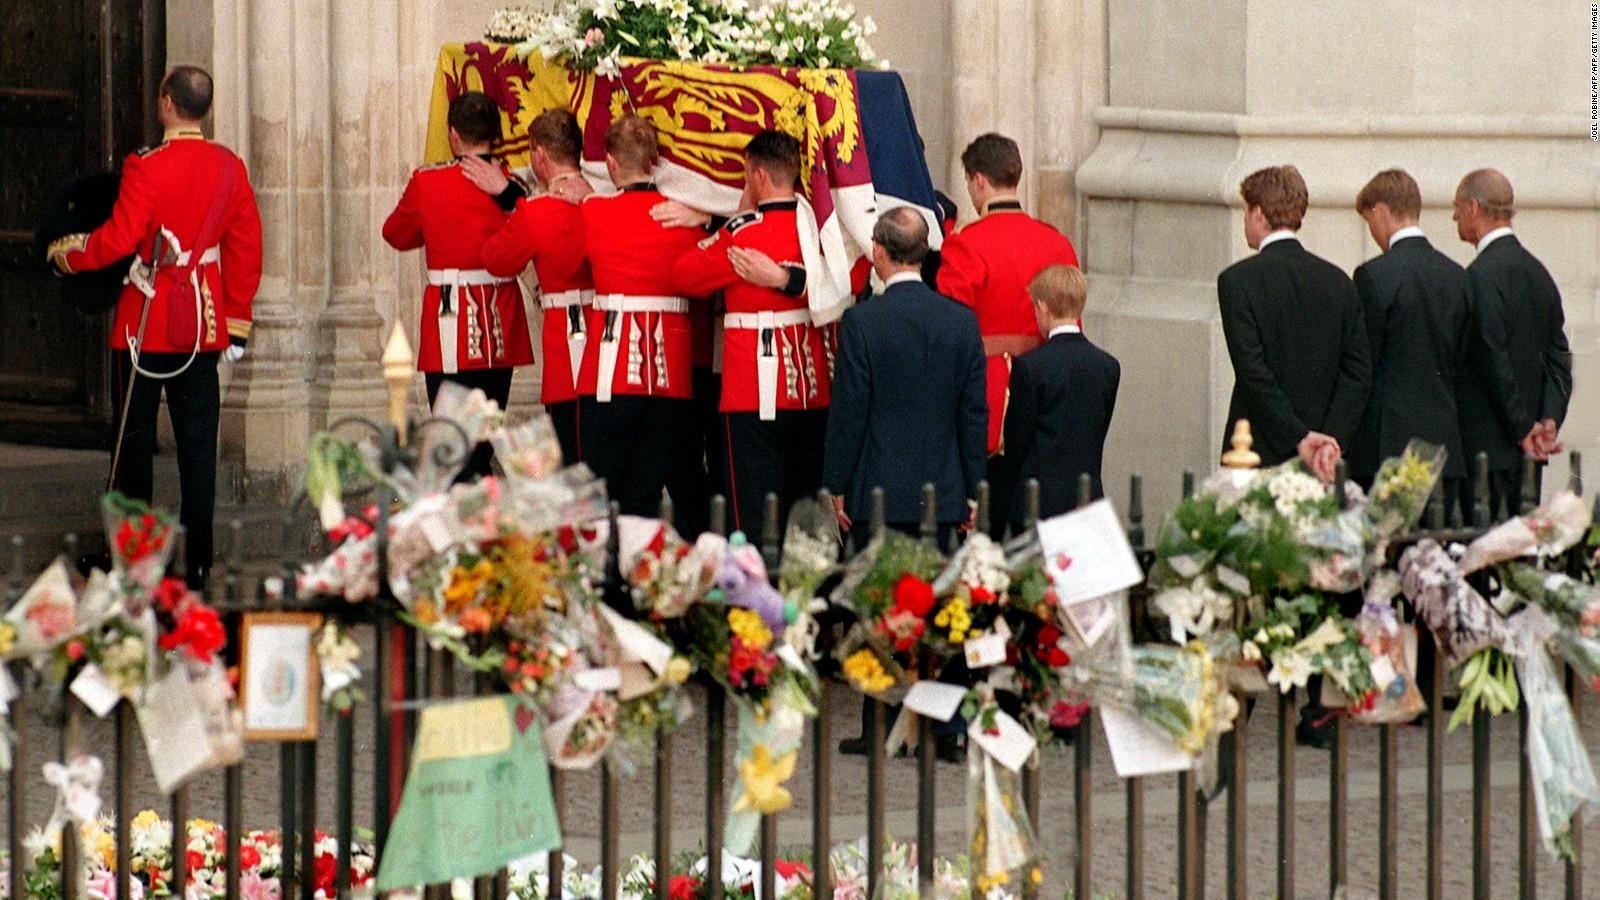 Princess Diana S Death Changed How Britons Saw Their Royals Cnn